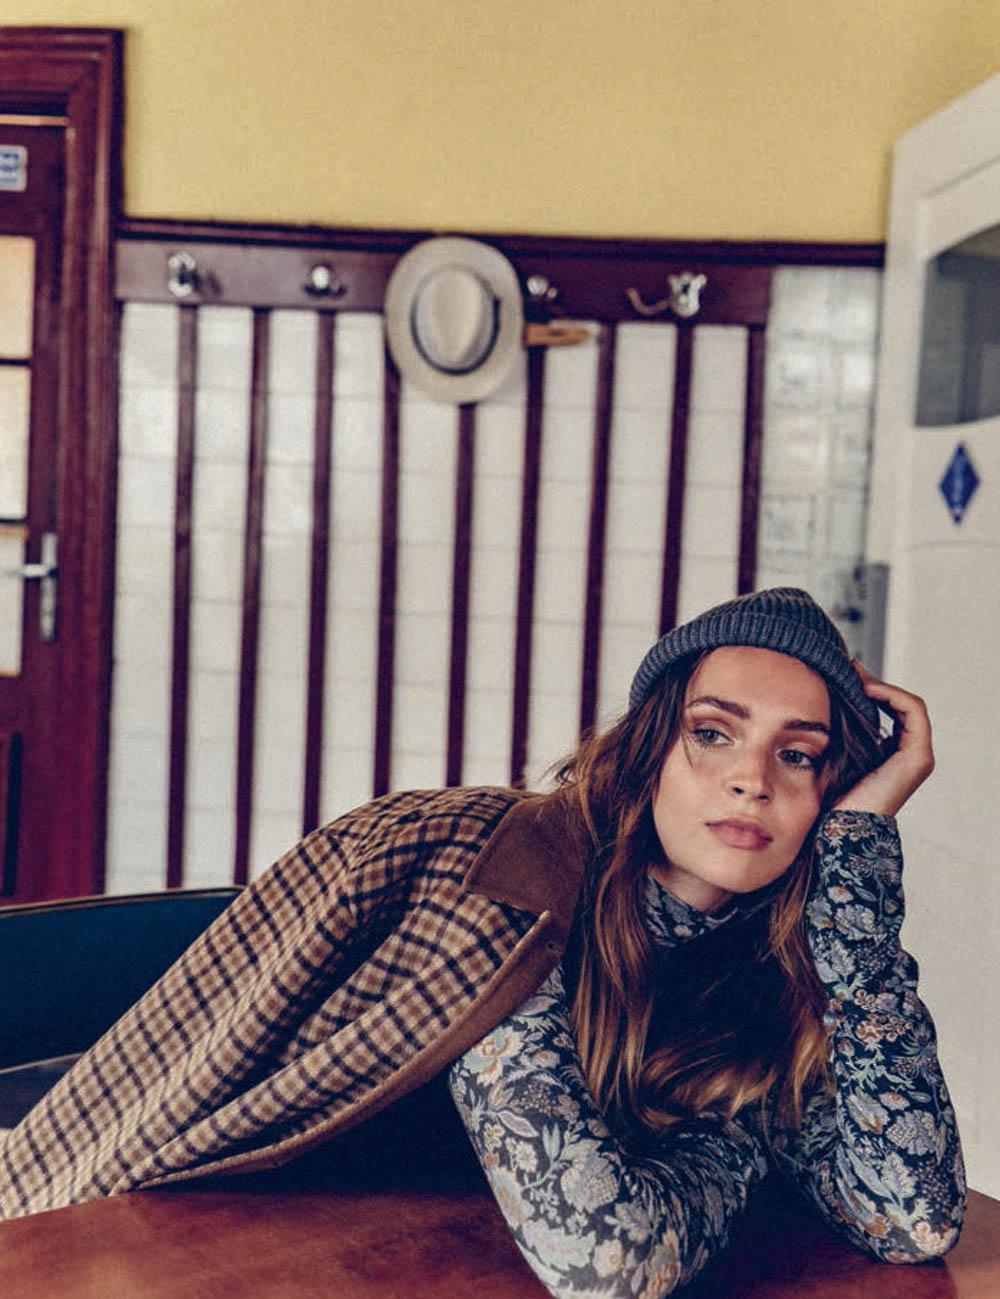 Maddie Kulicka by Bart Pogoda for Vogue Poland October 2019